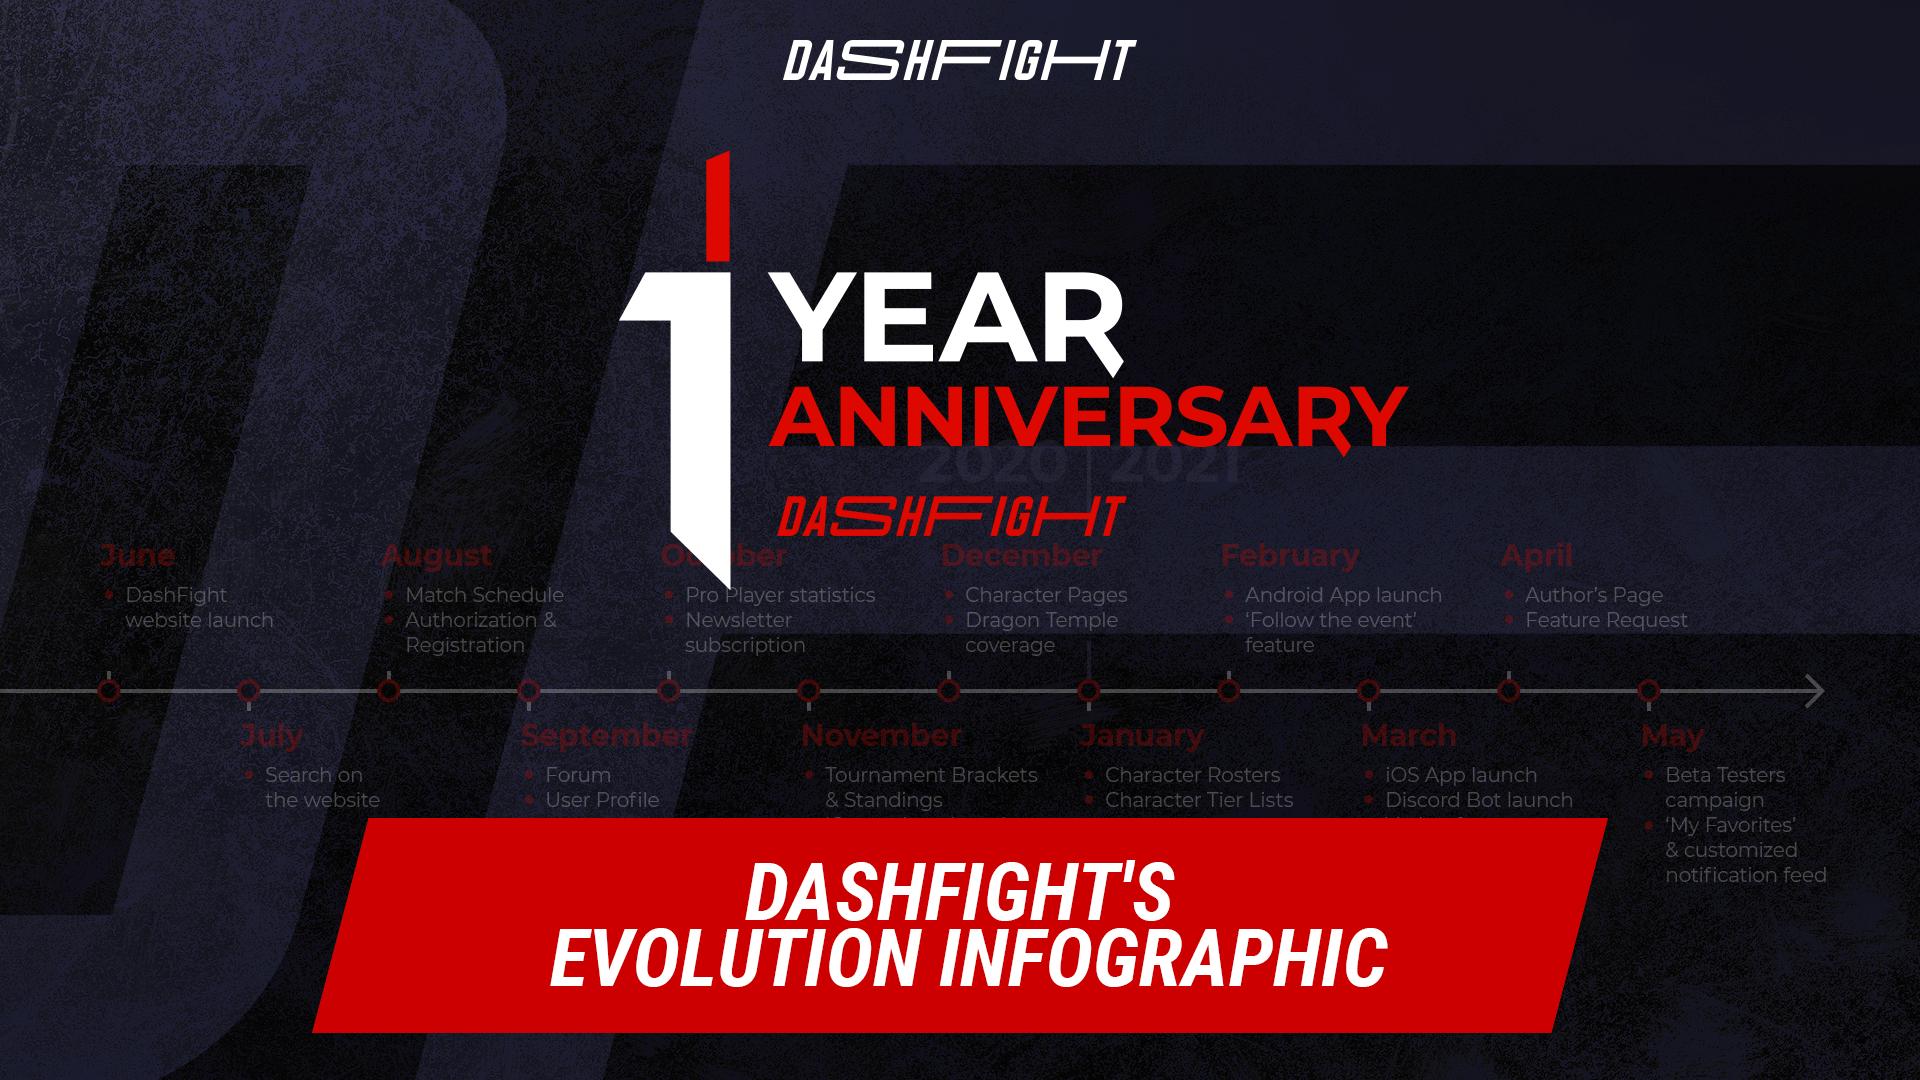 DashFight's 1 Year Anniversary: The Journey So Far